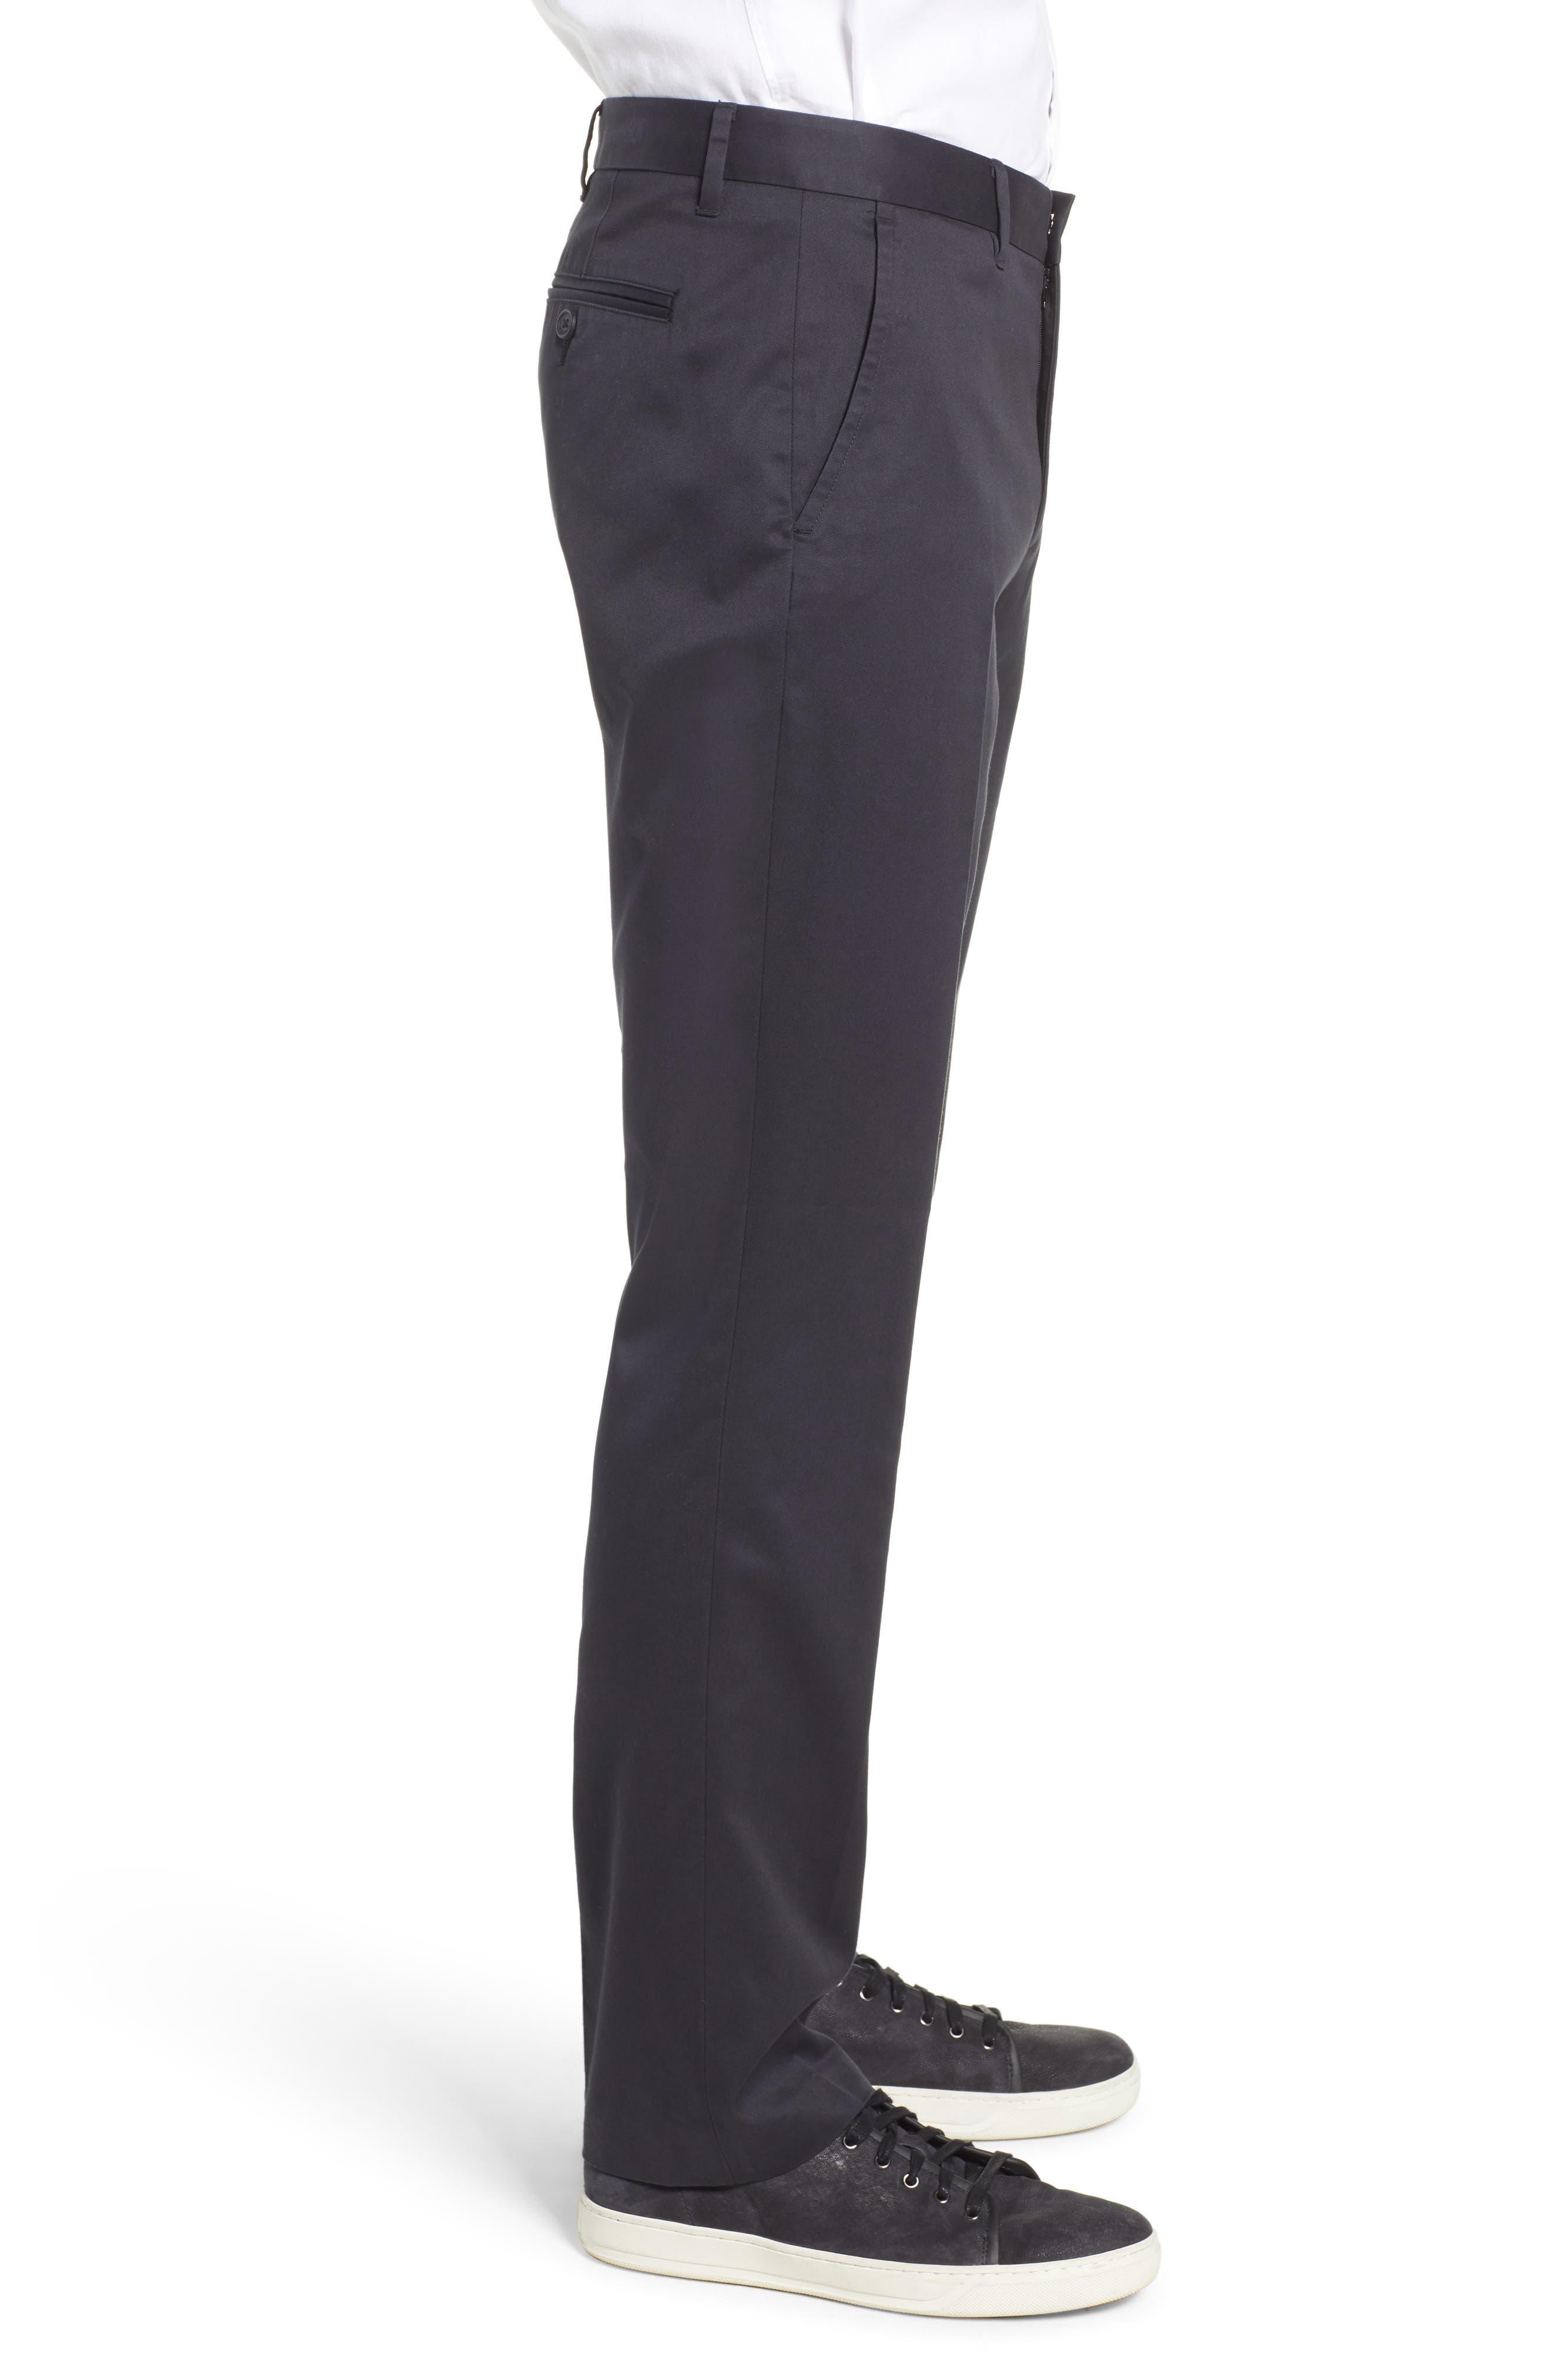 BONOBOS, Weekday Warrior Straight Leg Stretch Dress Pants, Alternate thumbnail 4, color, 001